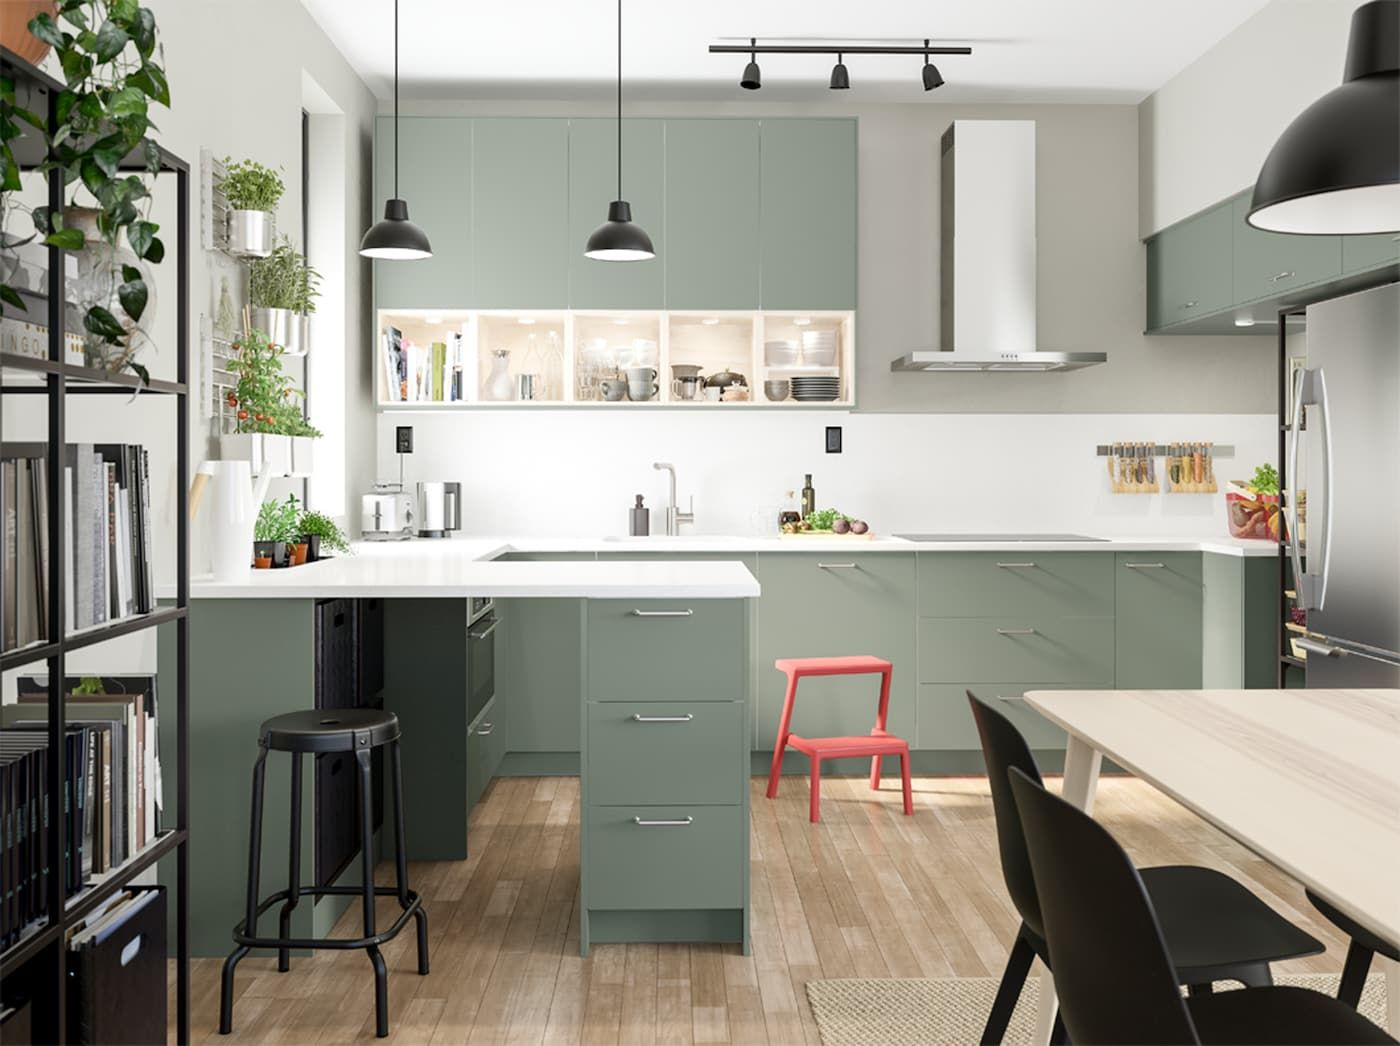 A dream kitchen Ikea kitchen, Home, Ikea